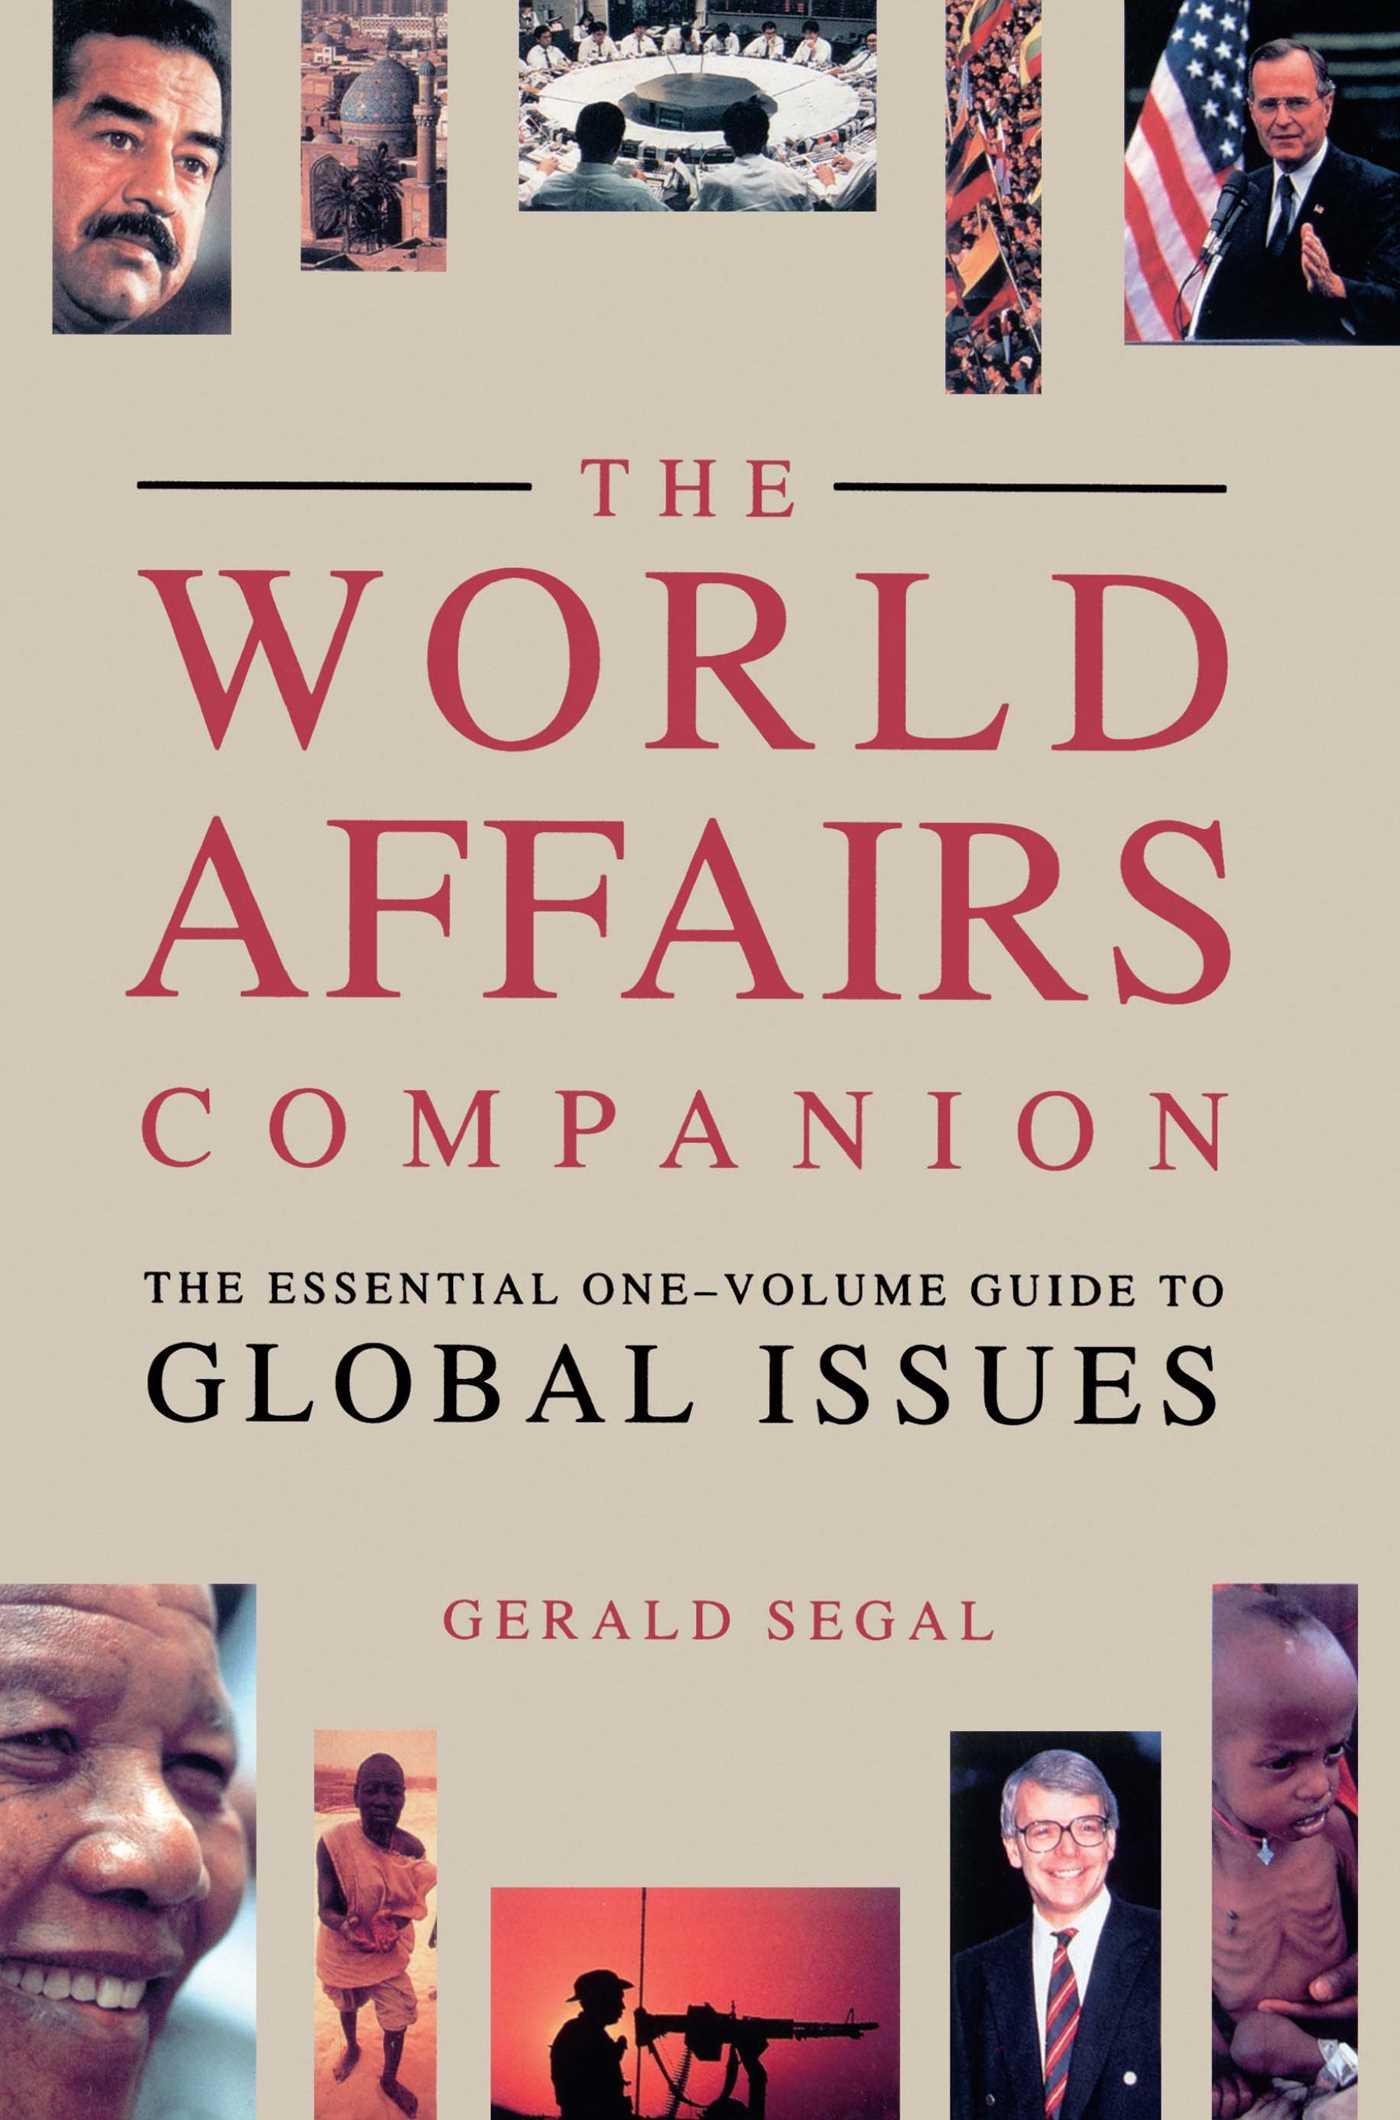 World affairs companion 9780671741563 hr